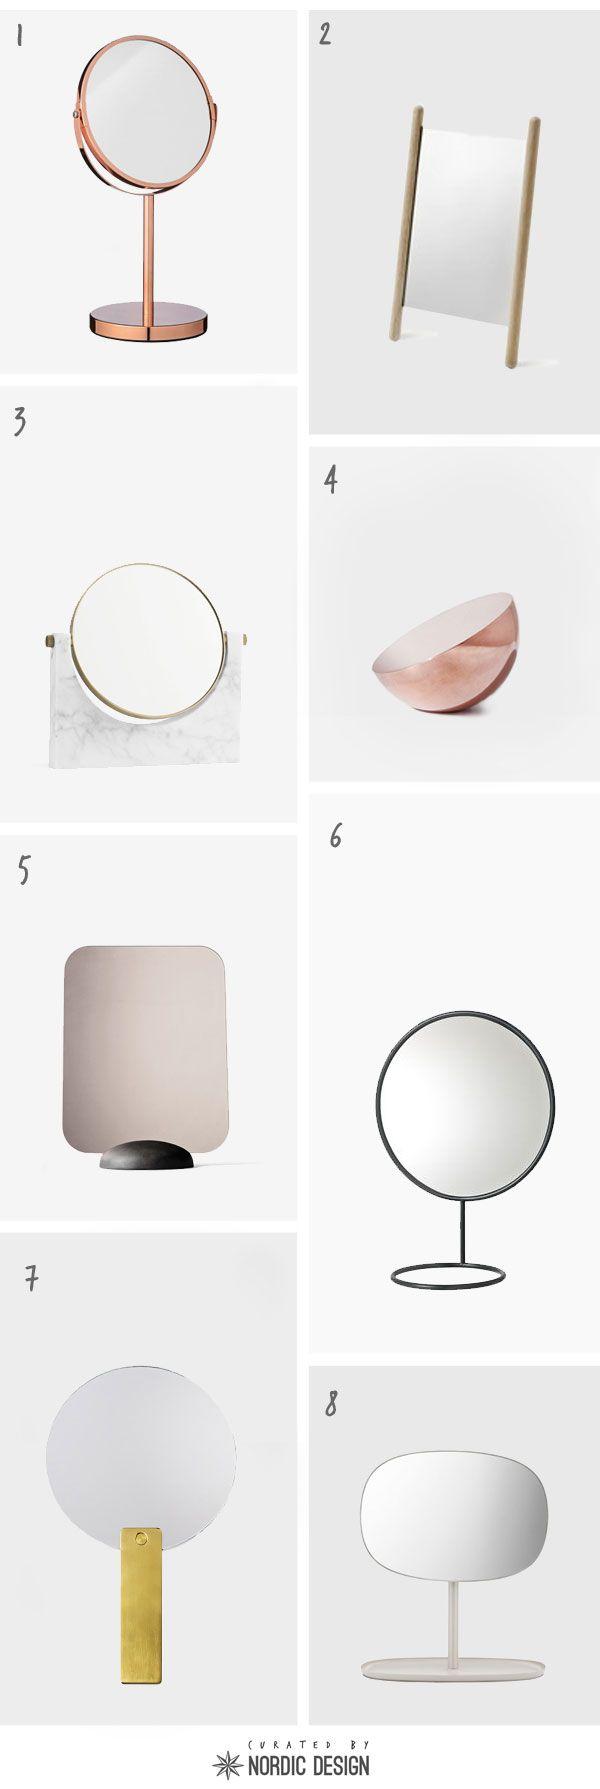 8 Beautiful Table Mirrors From Scandinavian Designers Nordic Design Mirror Table Scandinavian Design Design